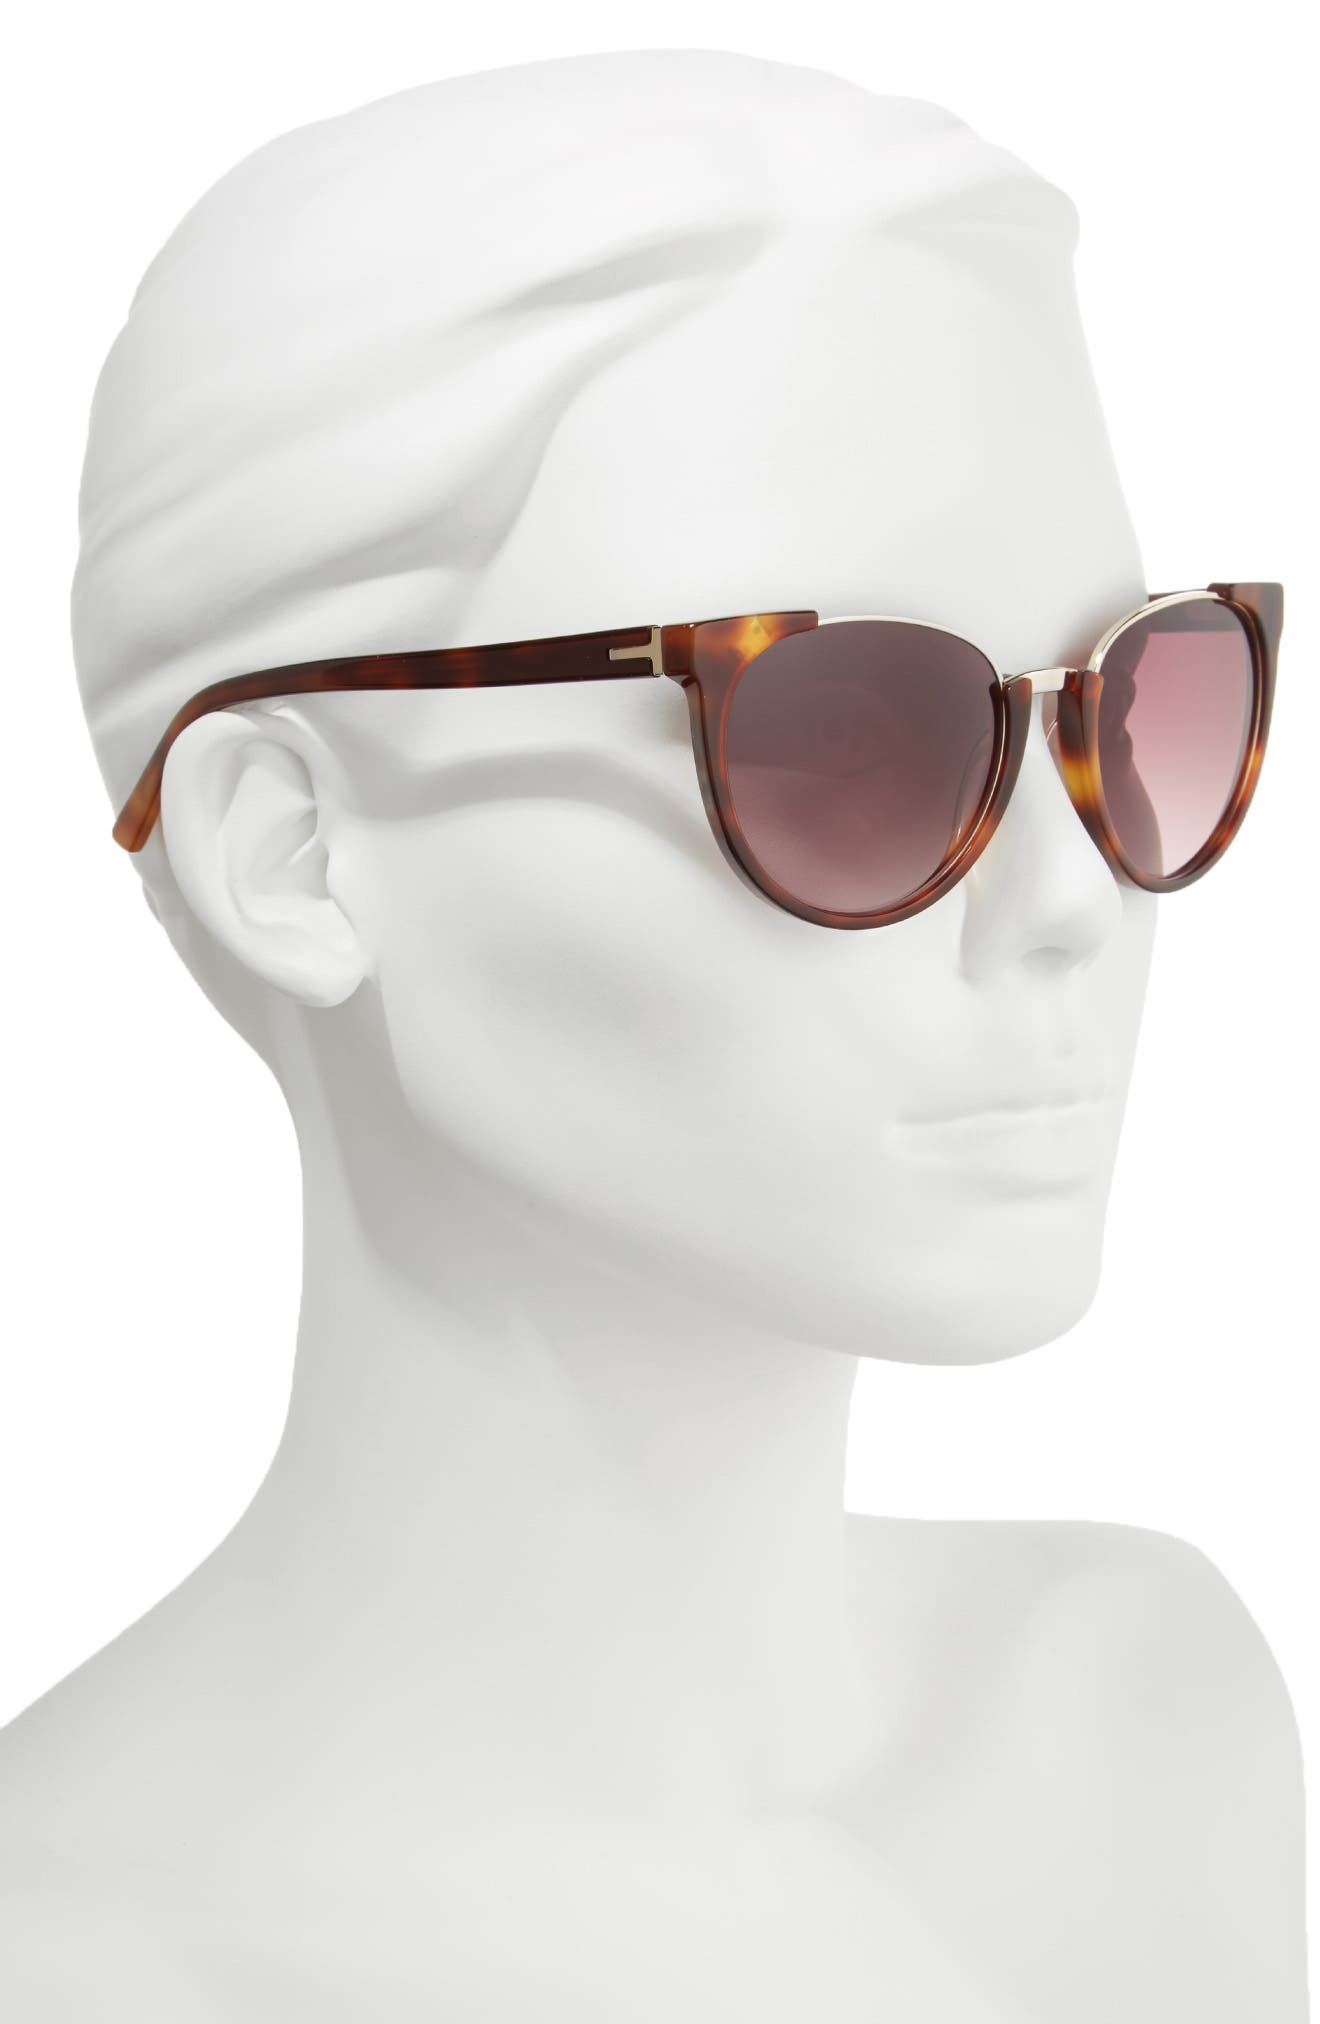 53mm Modified Oval Sunglasses,                             Alternate thumbnail 2, color,                             TORTOISE